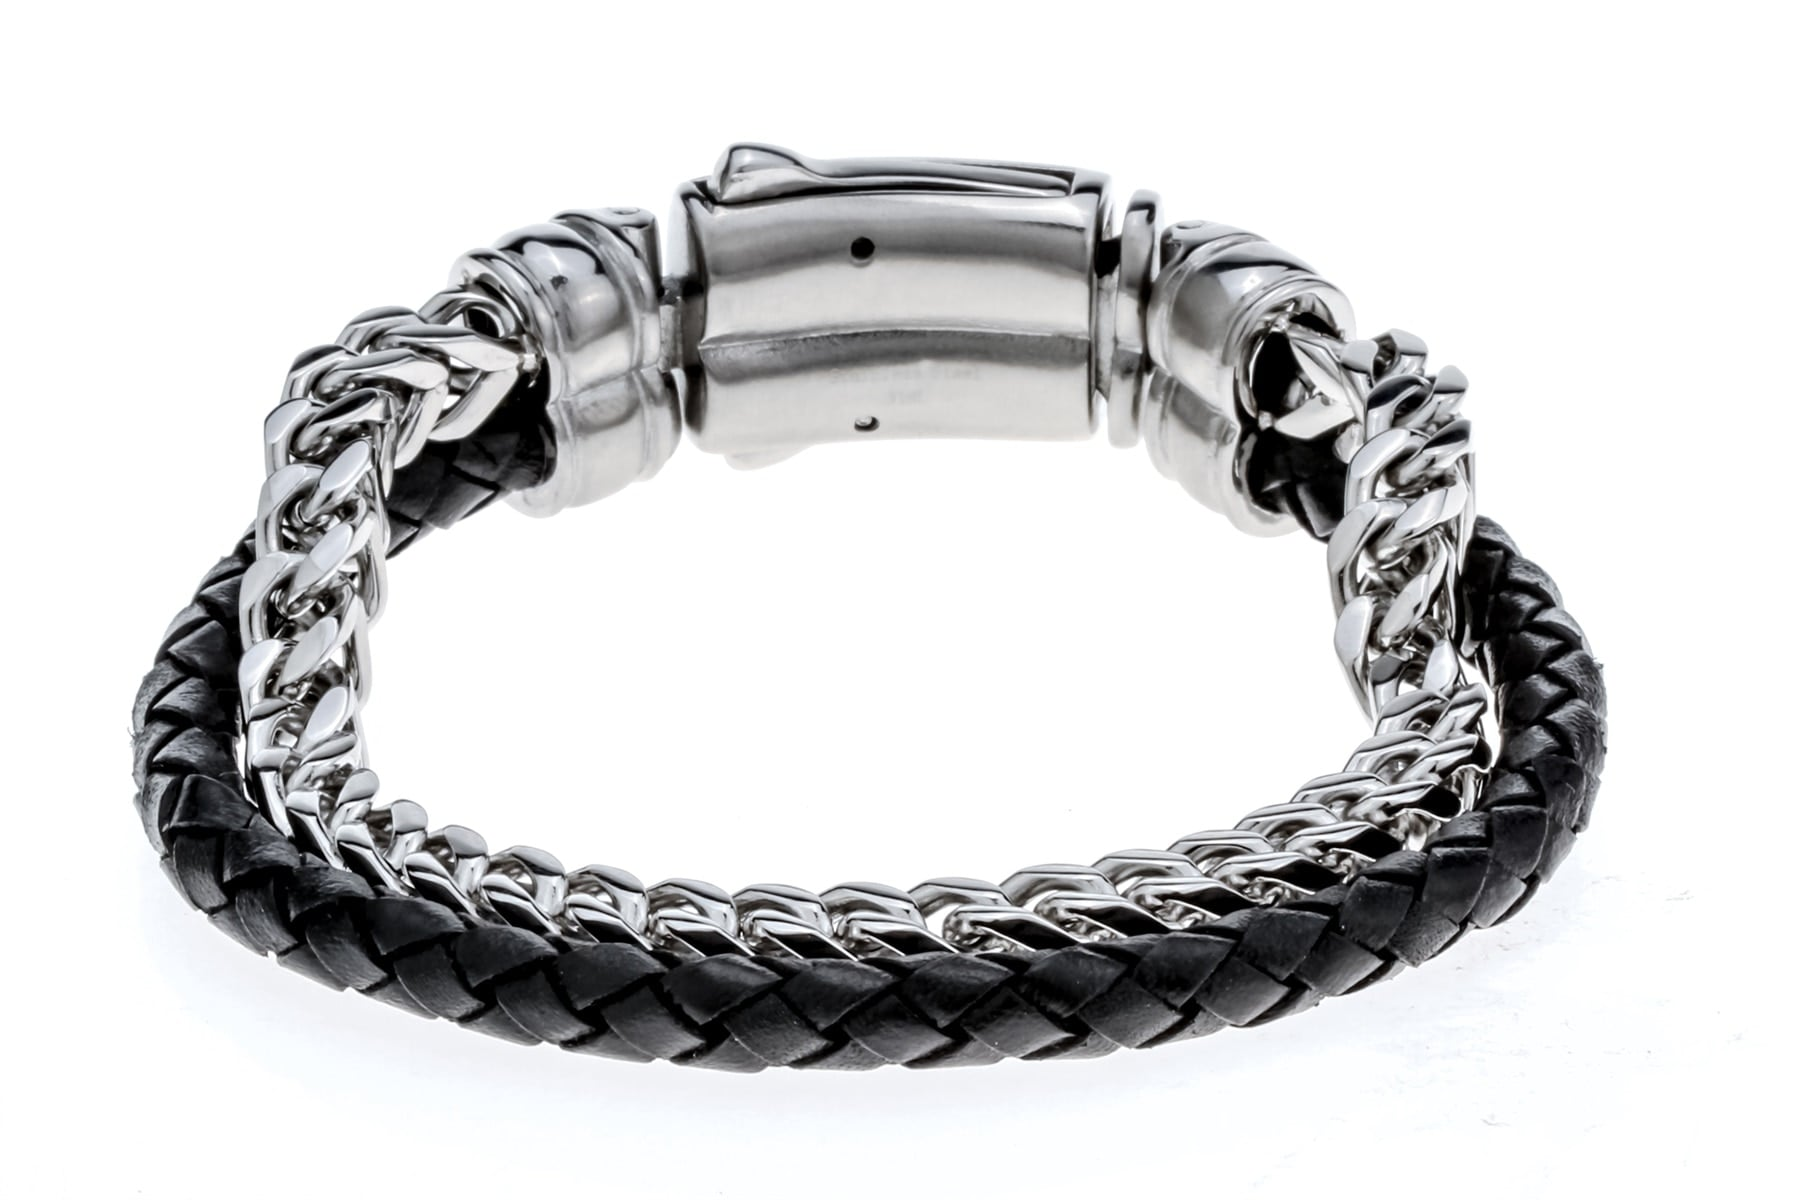 Men/'s Brown Leather Zinc Alloy Bracelet adjustable 6.5-8.5inch